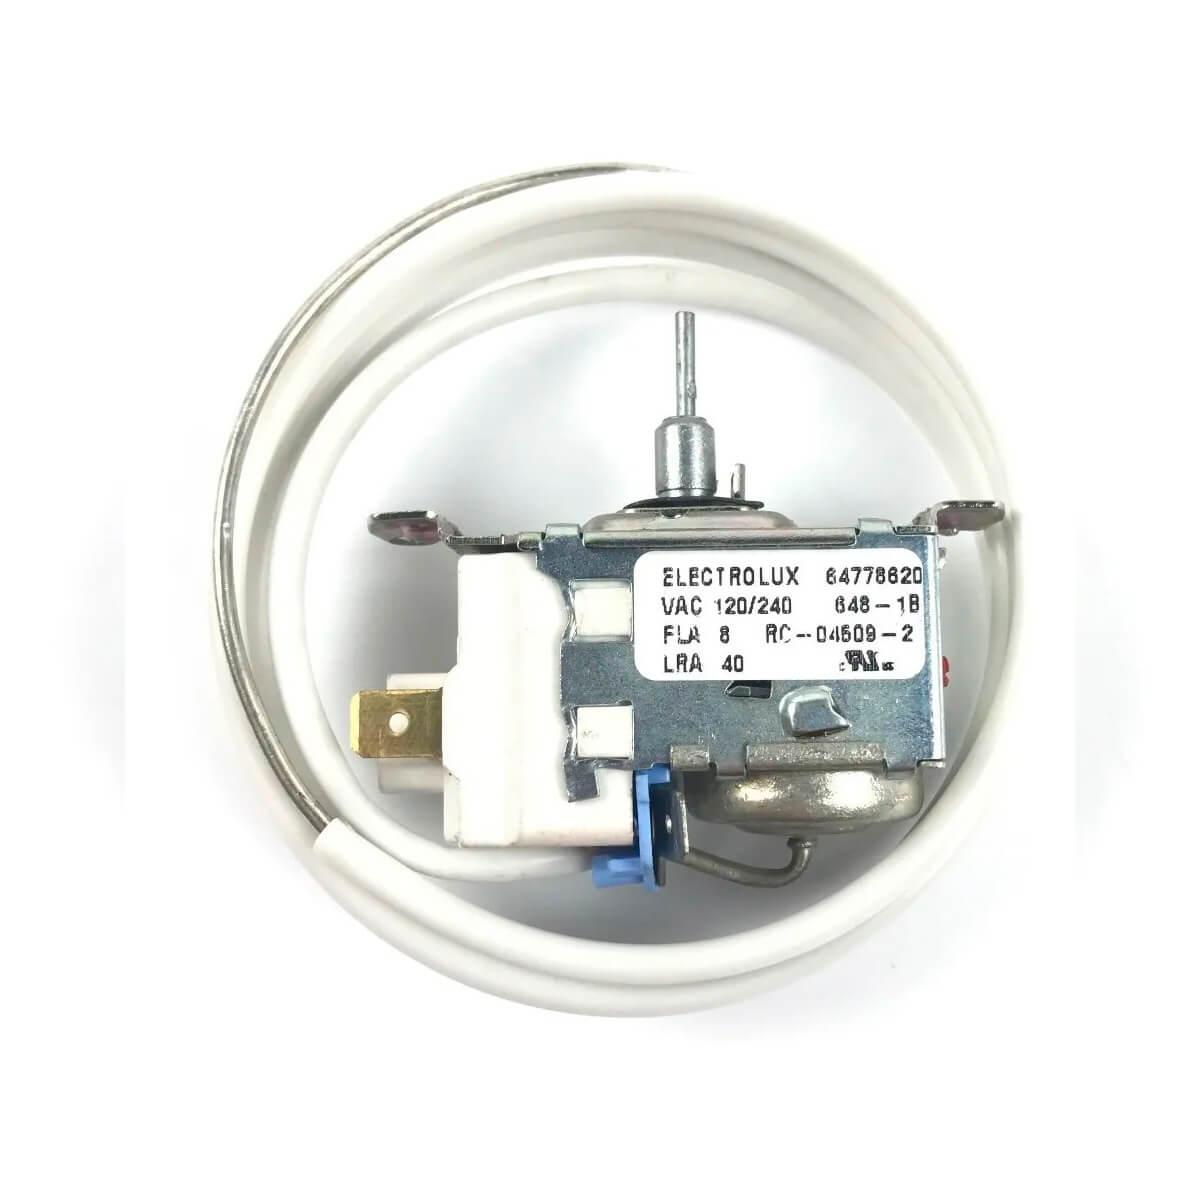 Termostato Push Button Refrigerador Electrolux R310 R330 R360 - 64778620